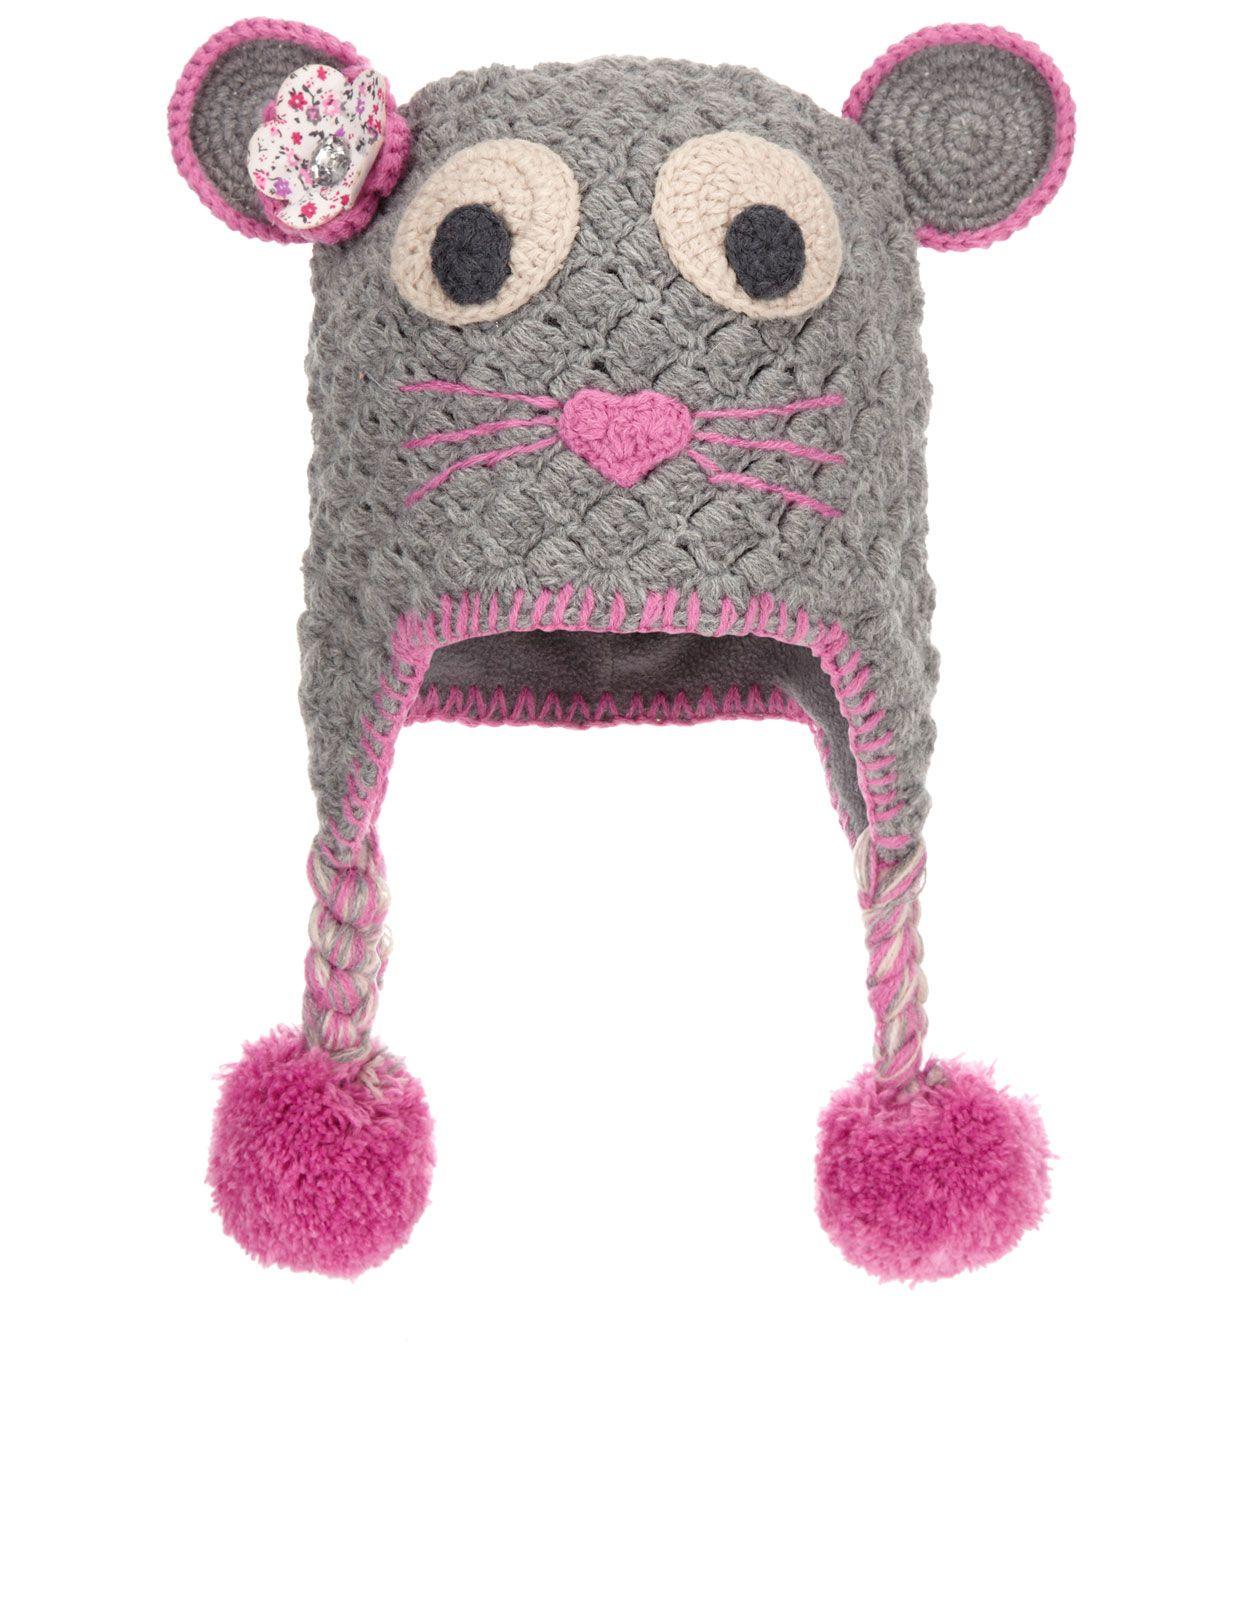 Crochet Mouse Chullo Hat